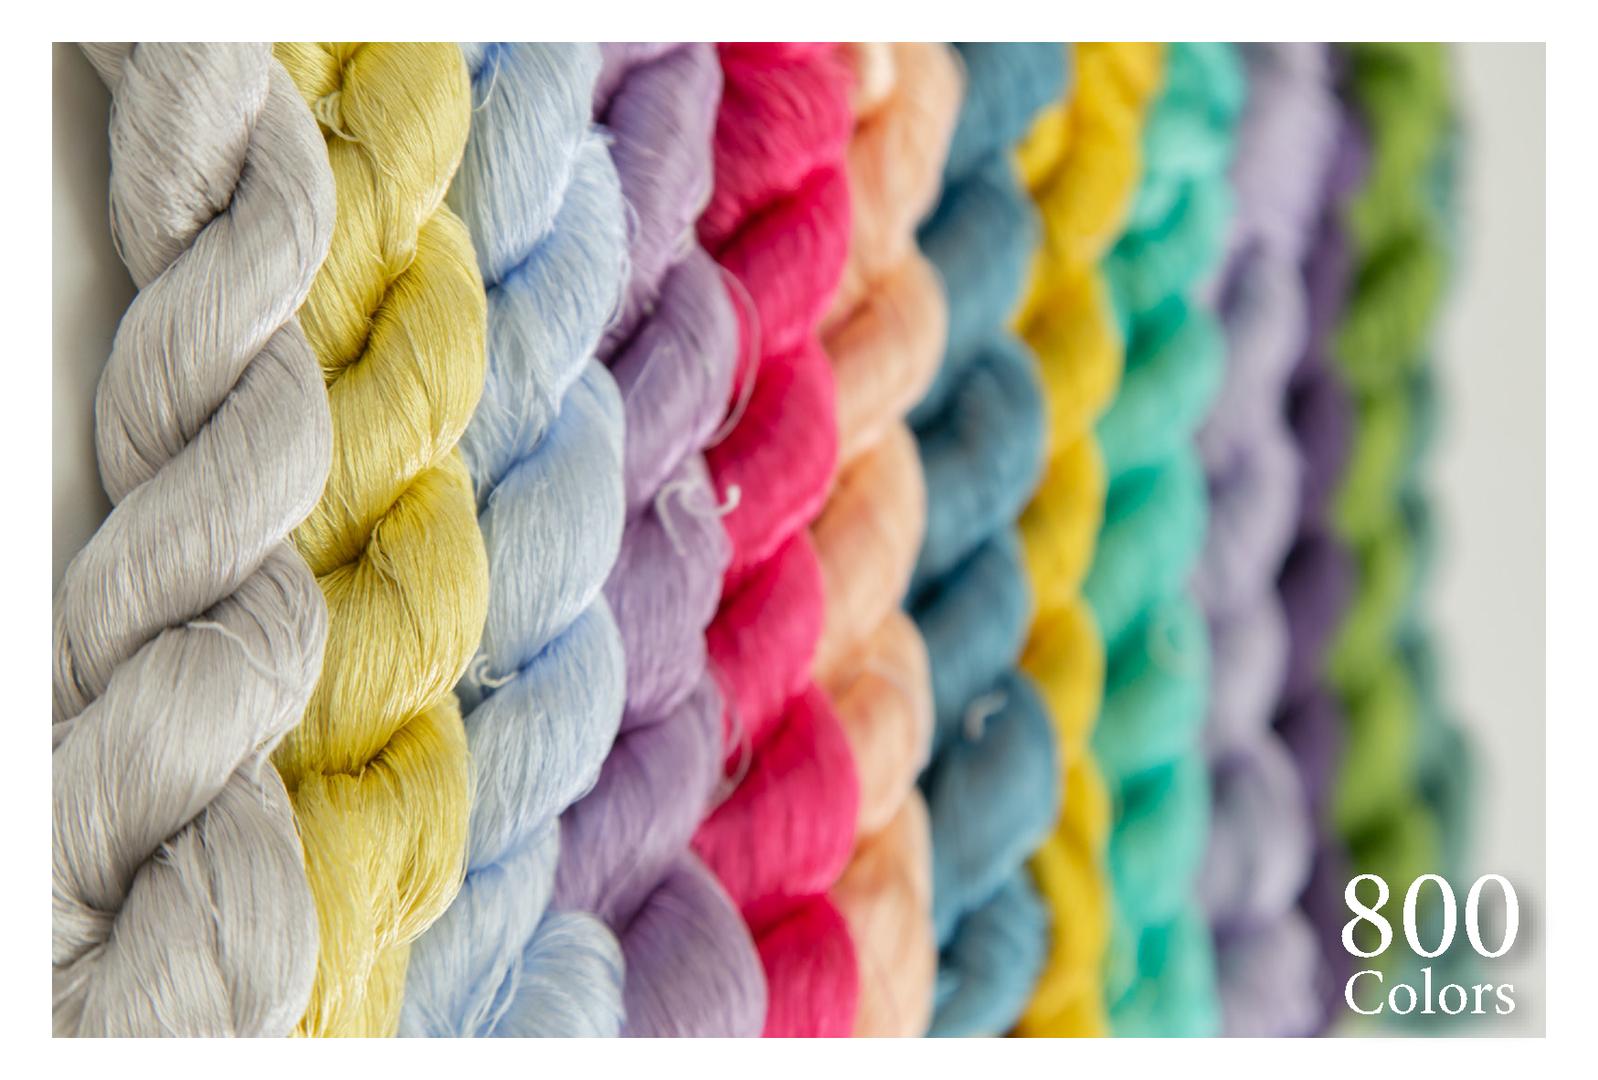 800 Colors